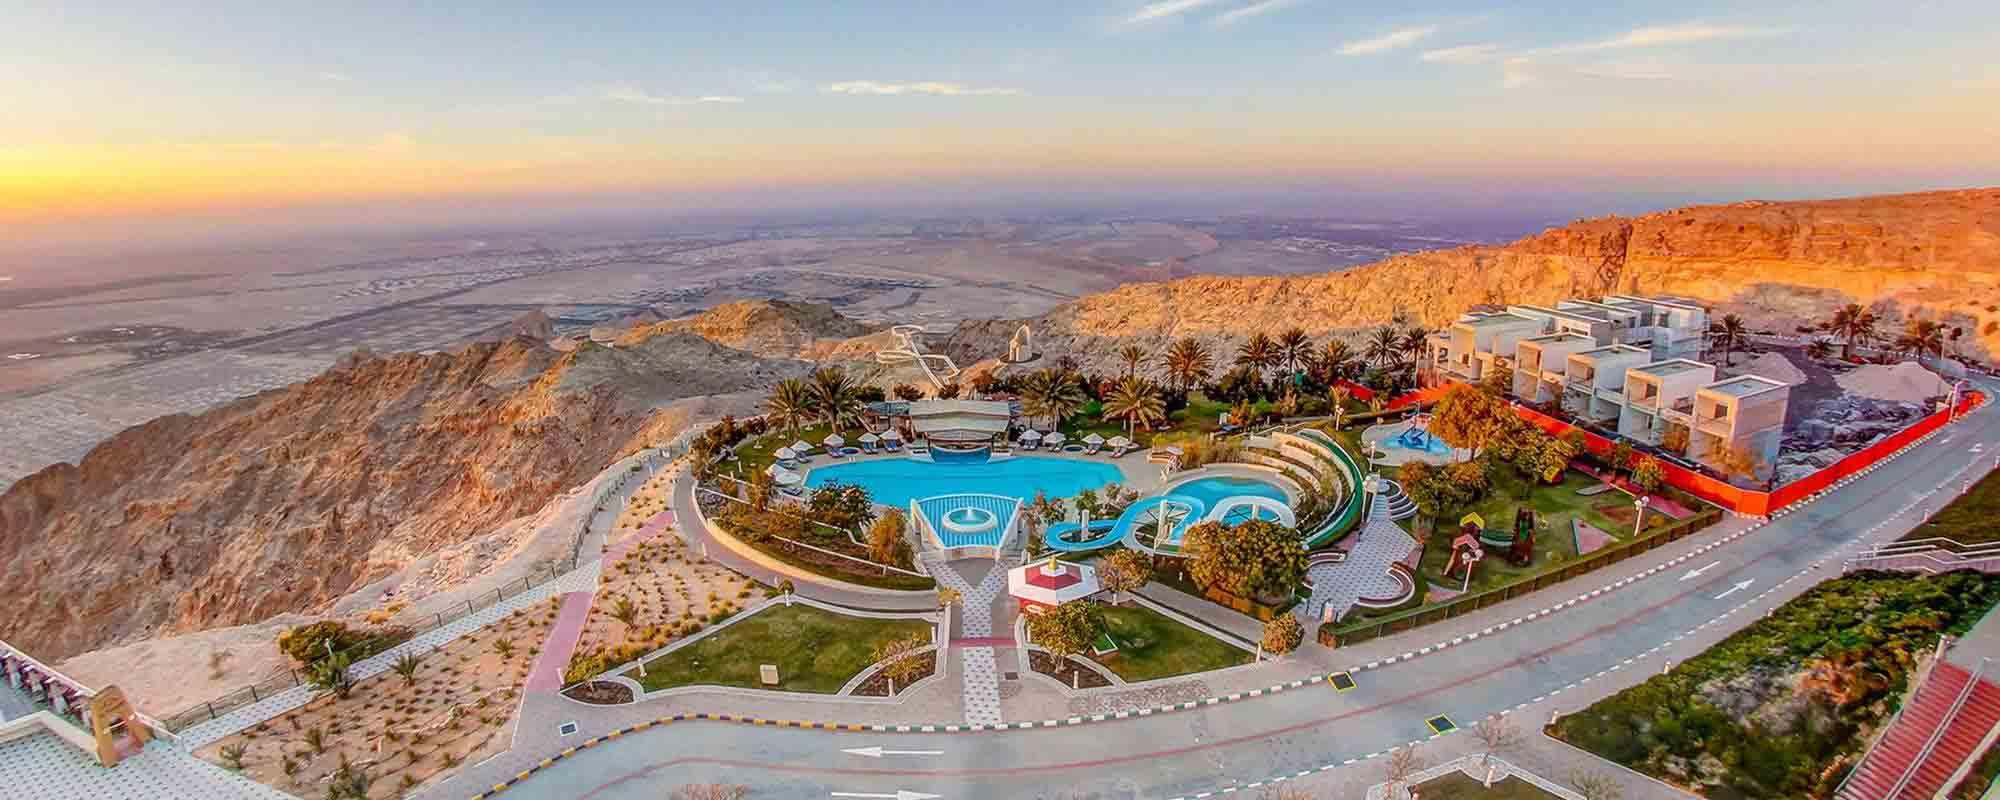 Mercure Grand - Jebel Hafeet Al Ain